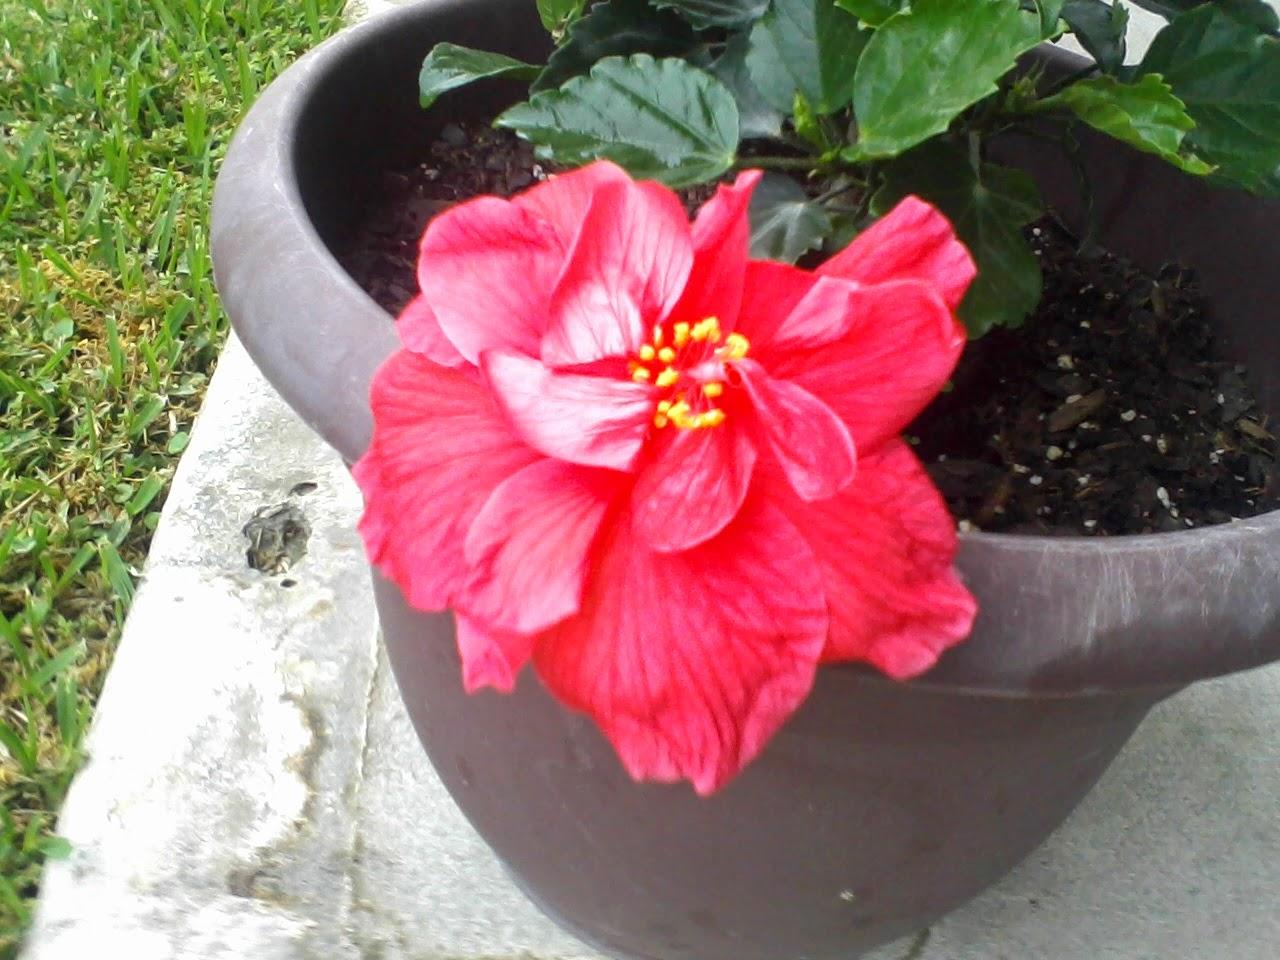 Gardening 2014 - 0406095003.jpg